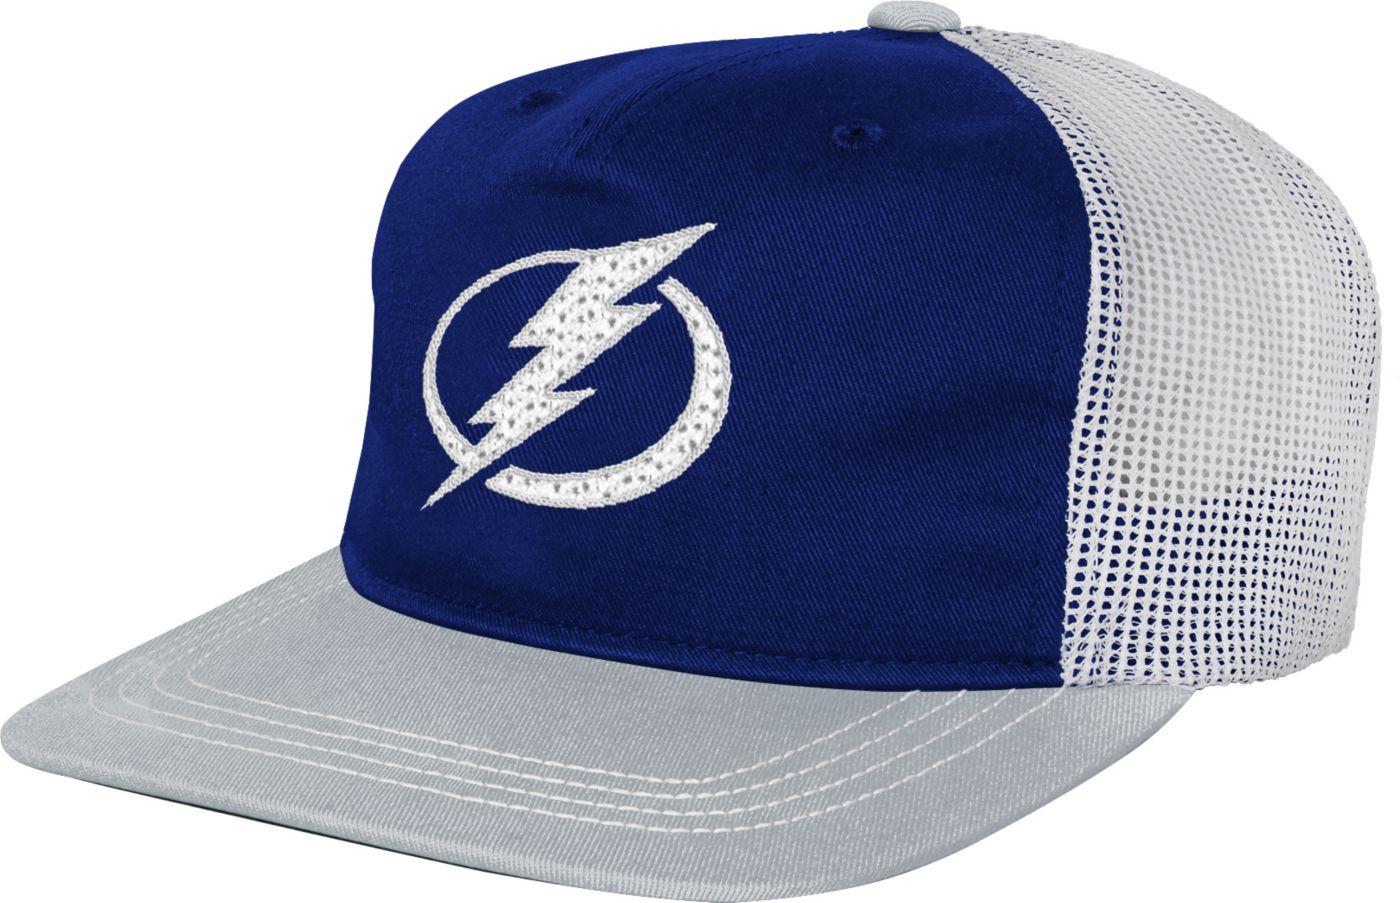 NHL Youth Tampa Bay Lightning Striped Trucker  Adjustable Hat